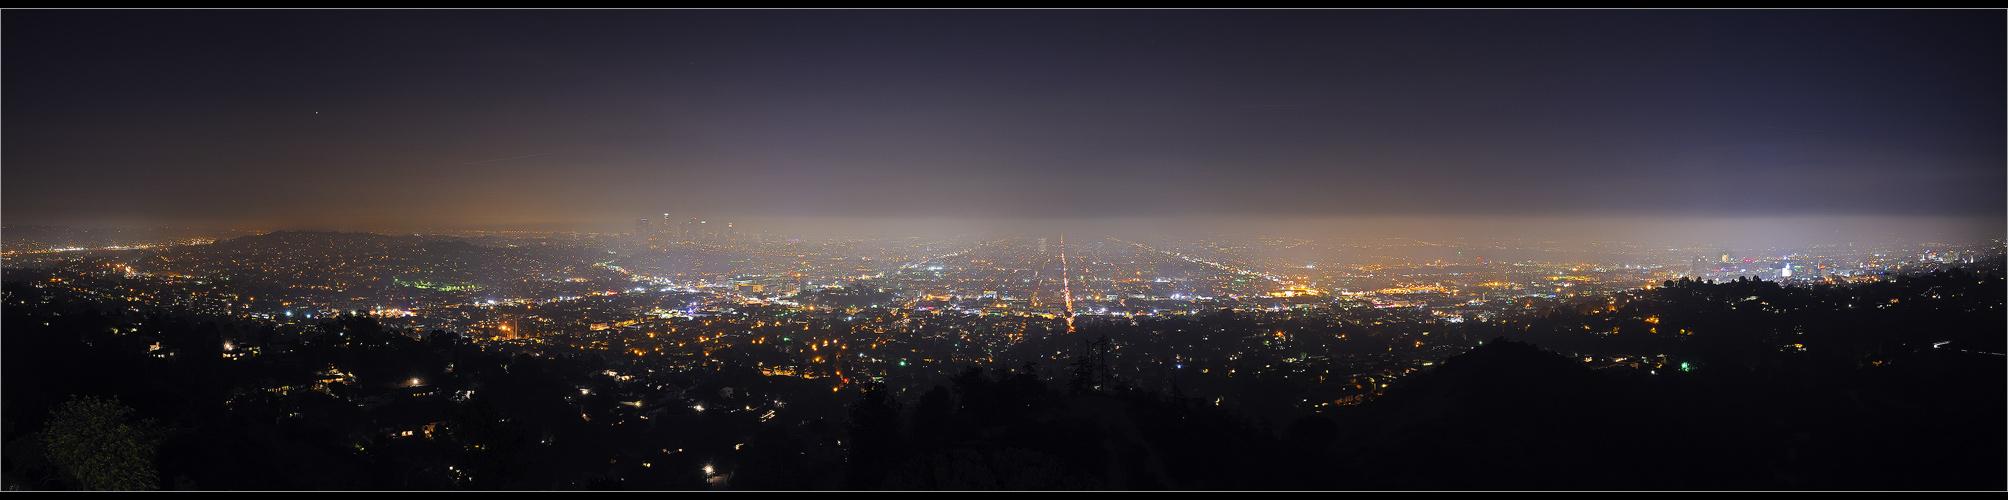 ... City of Angels ...